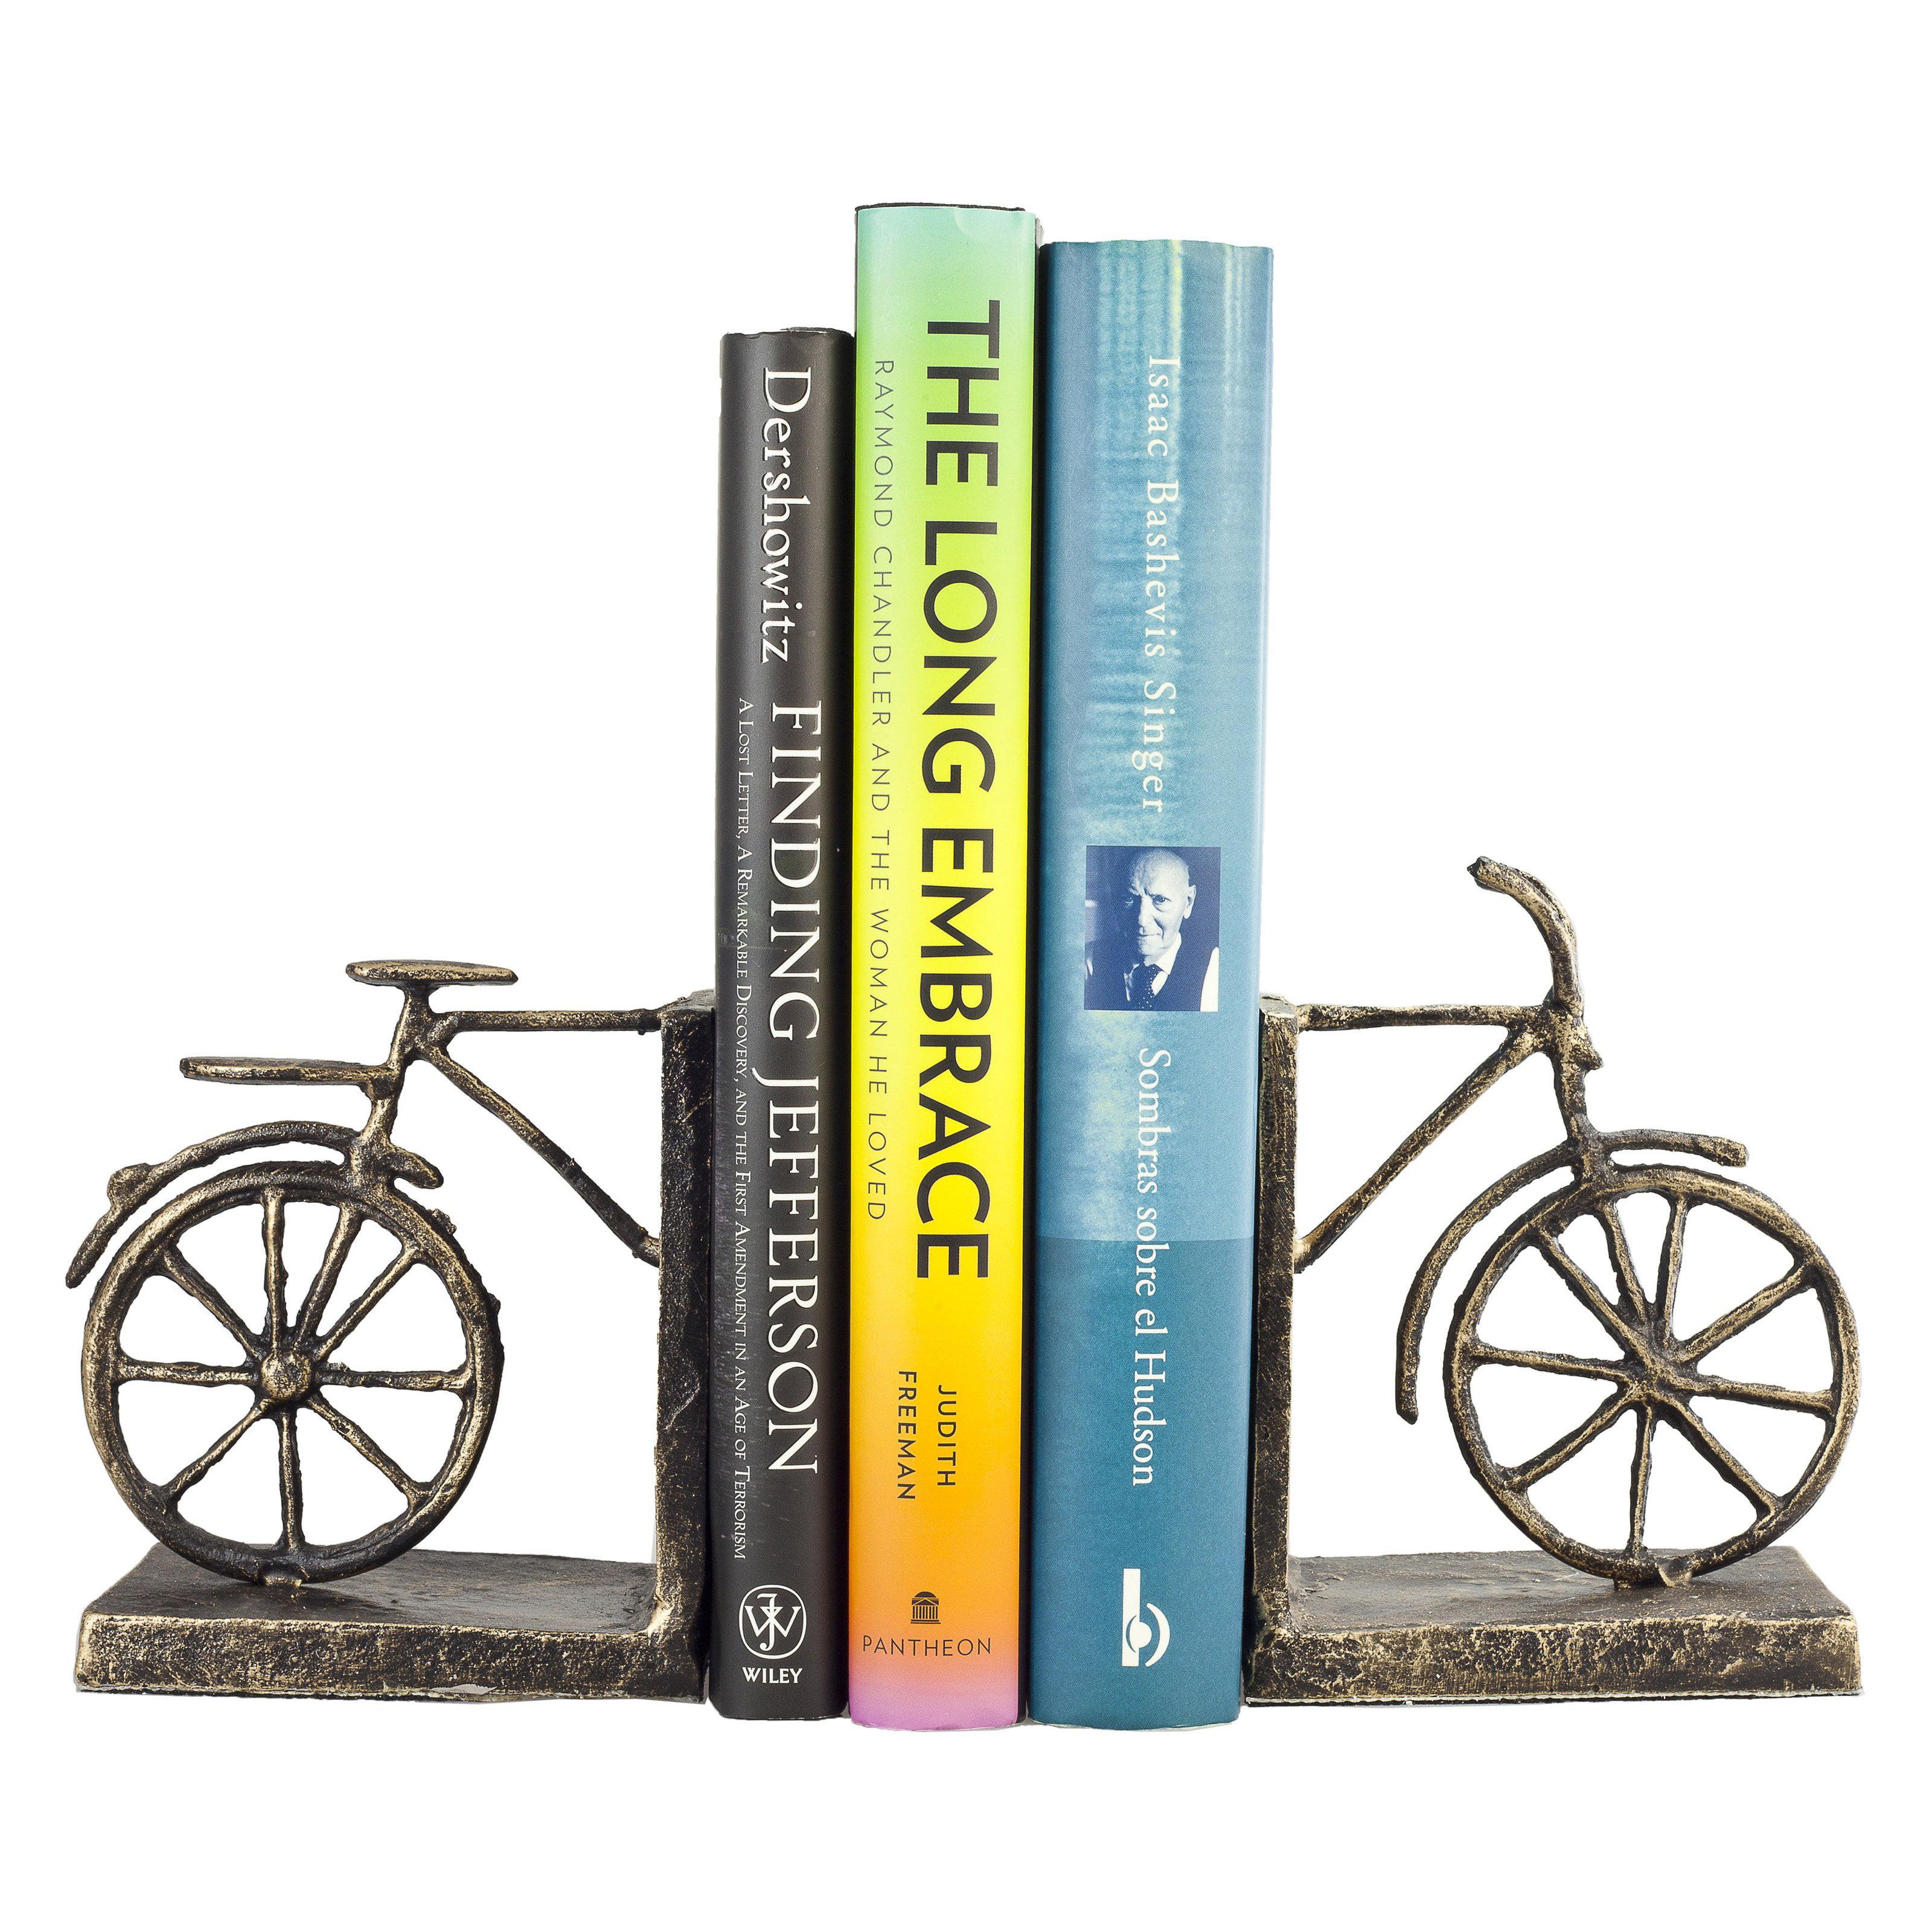 Danya B Bicycle Bookend Set by Danya B